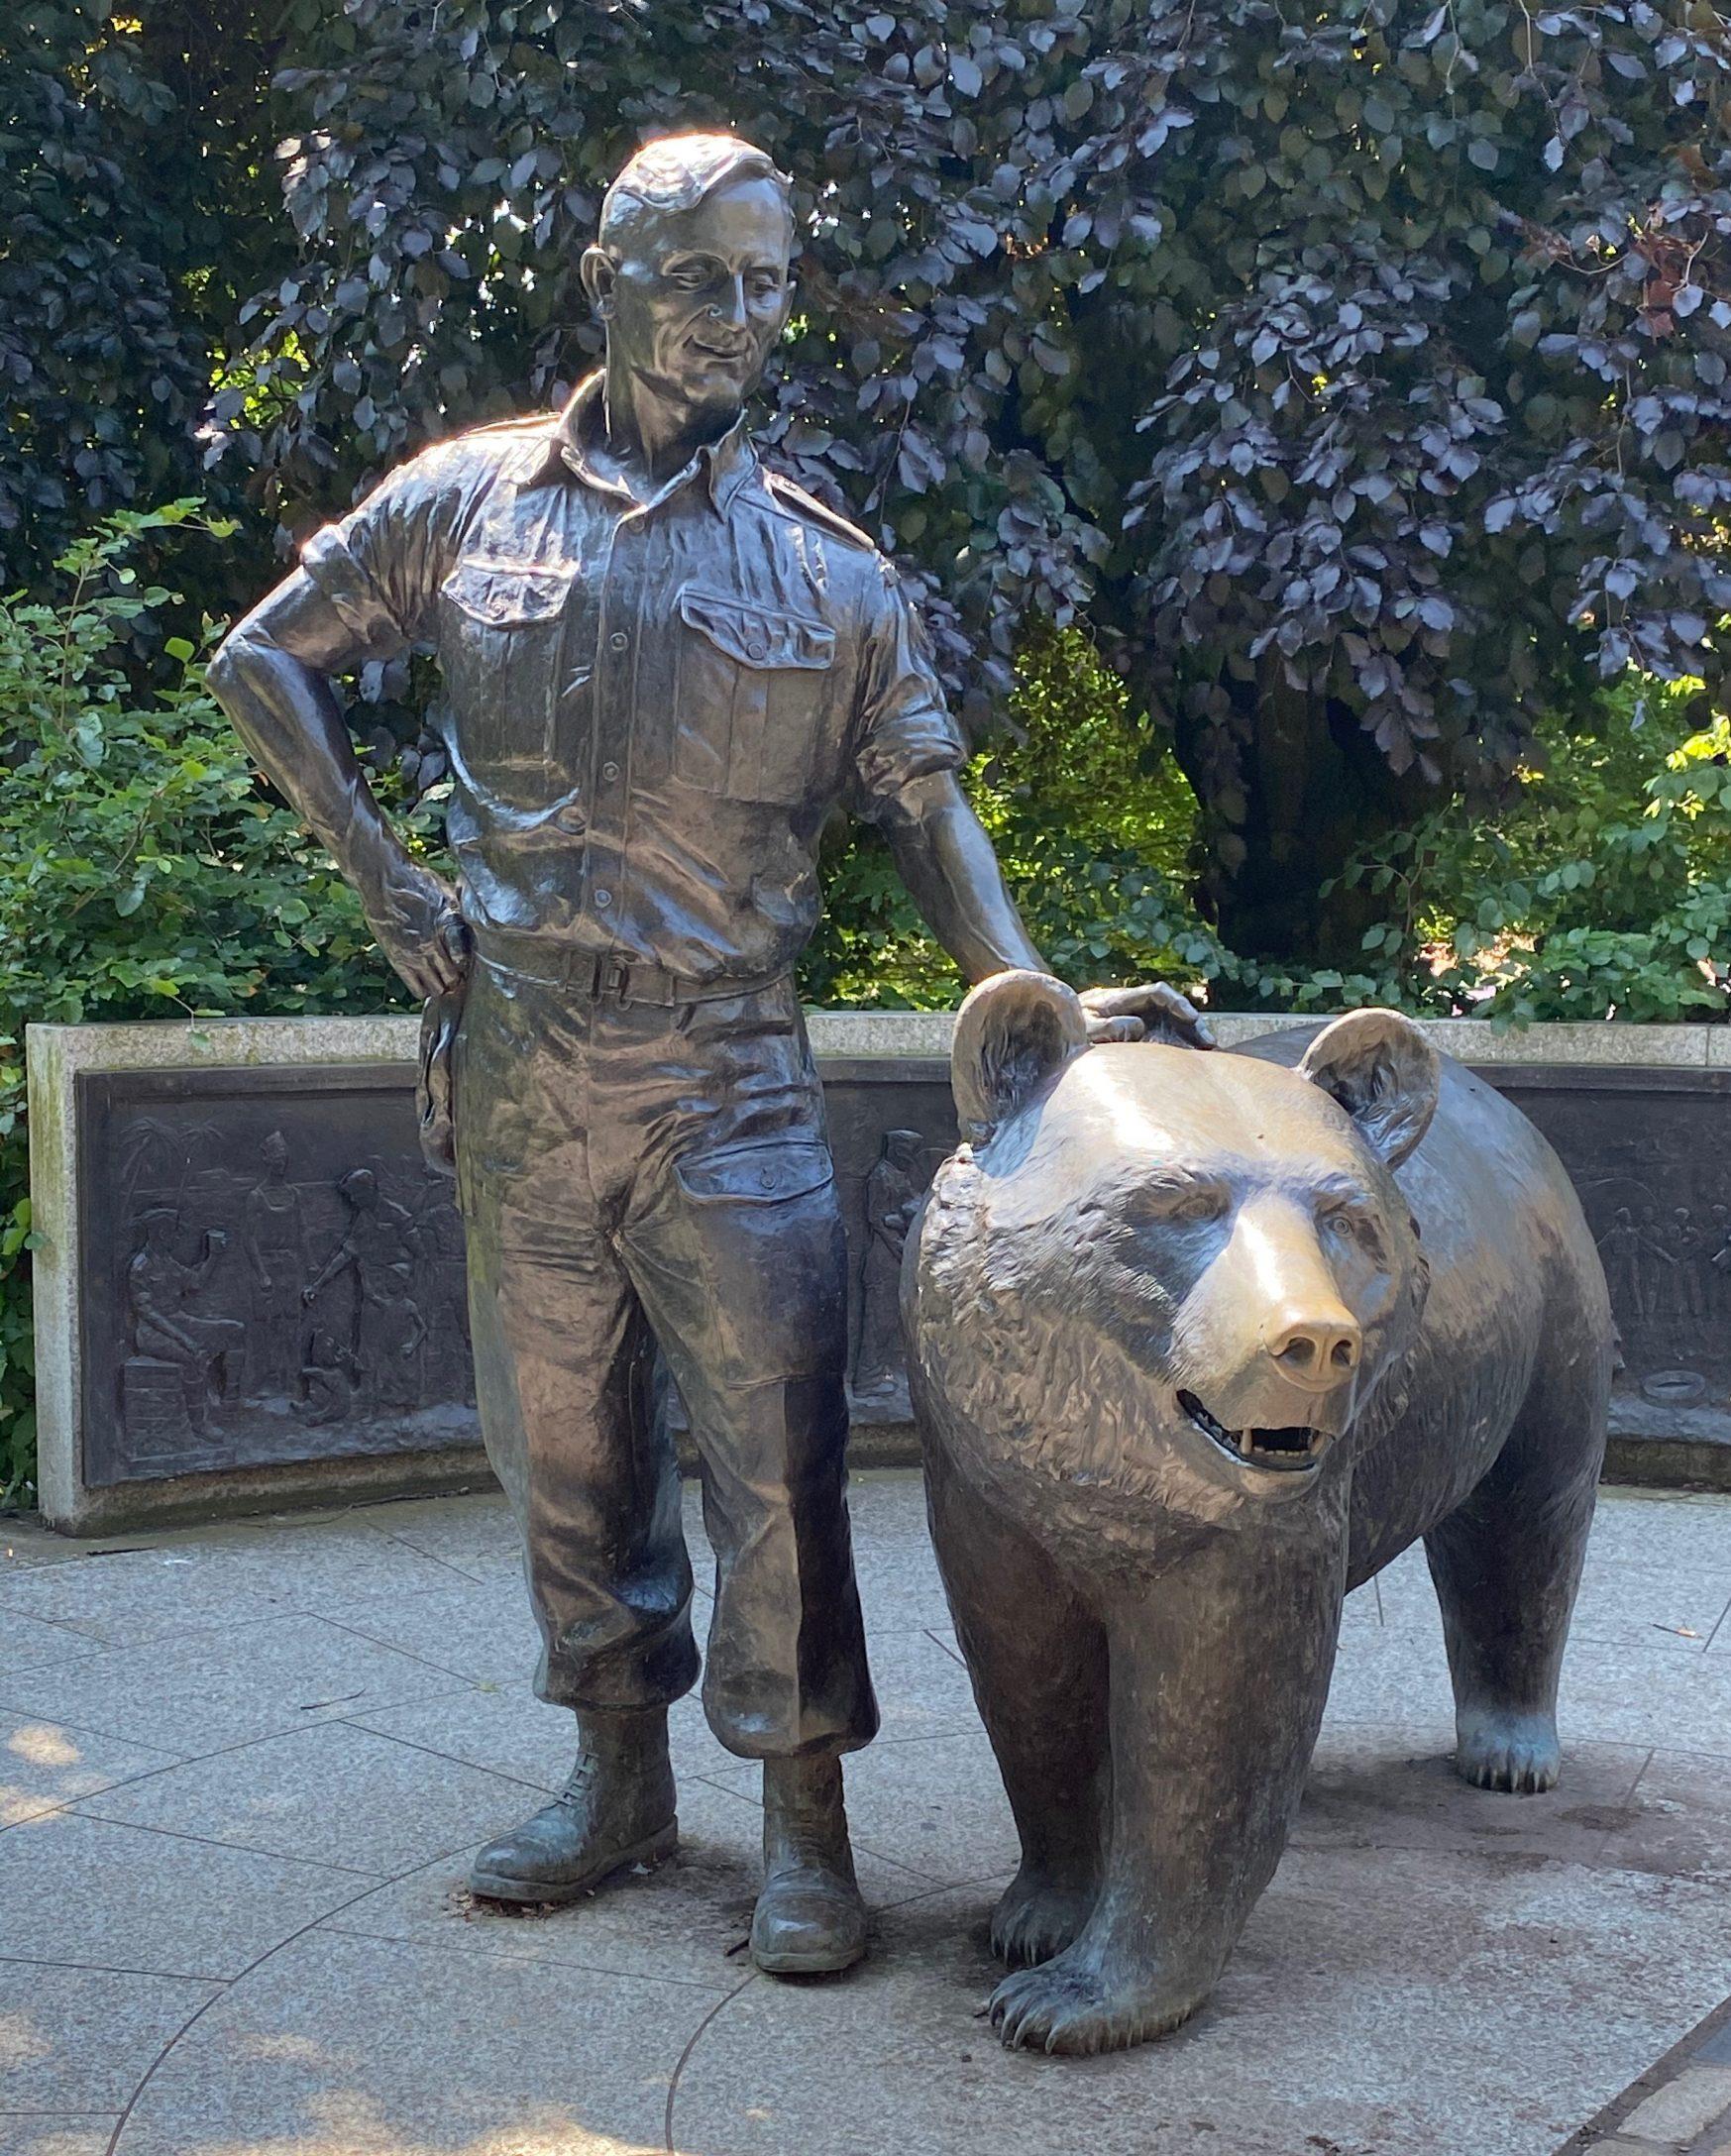 WOJTEK statue in Edinburgh's Princes Street Gardens, J Rutherford